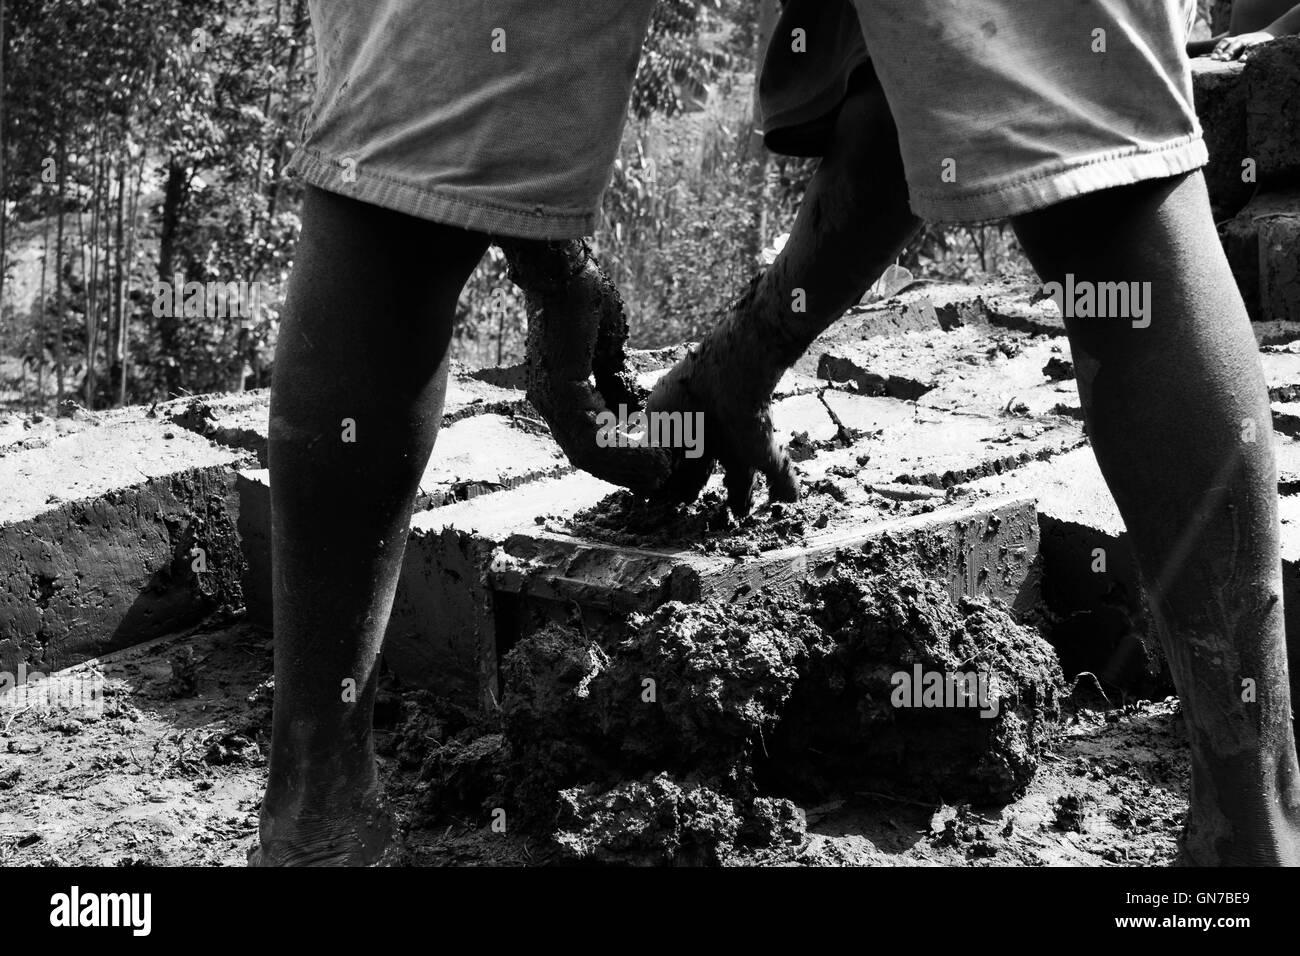 A Rwandese boy is making a mud brick - Stock Image